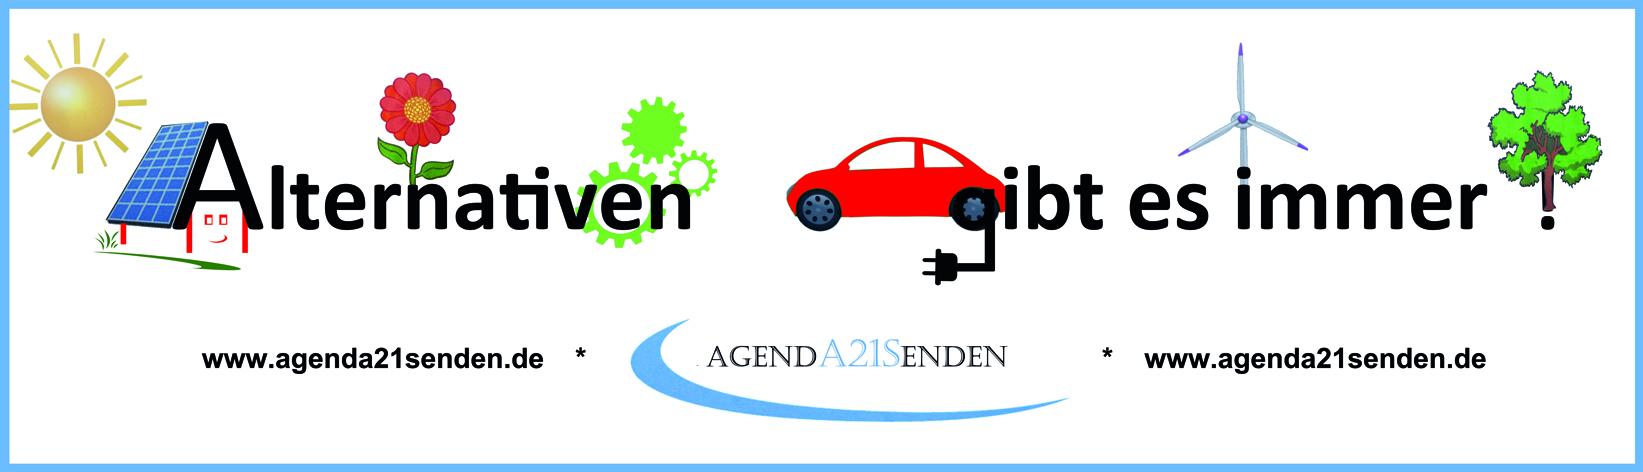 agenda21senden +++ agenda21senden mobil